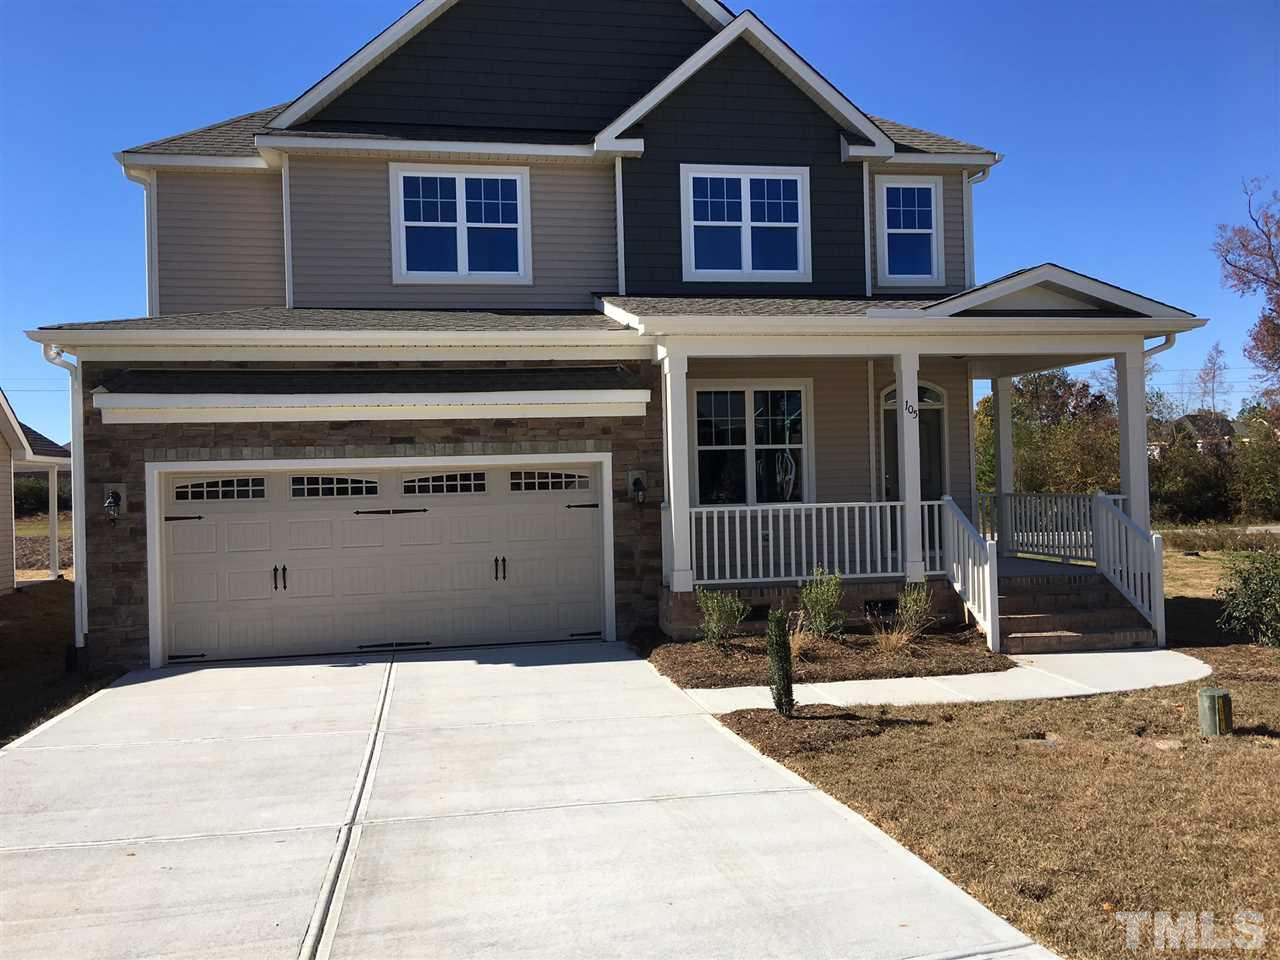 Photo of home for sale at 105 Thimble Way, Garner NC